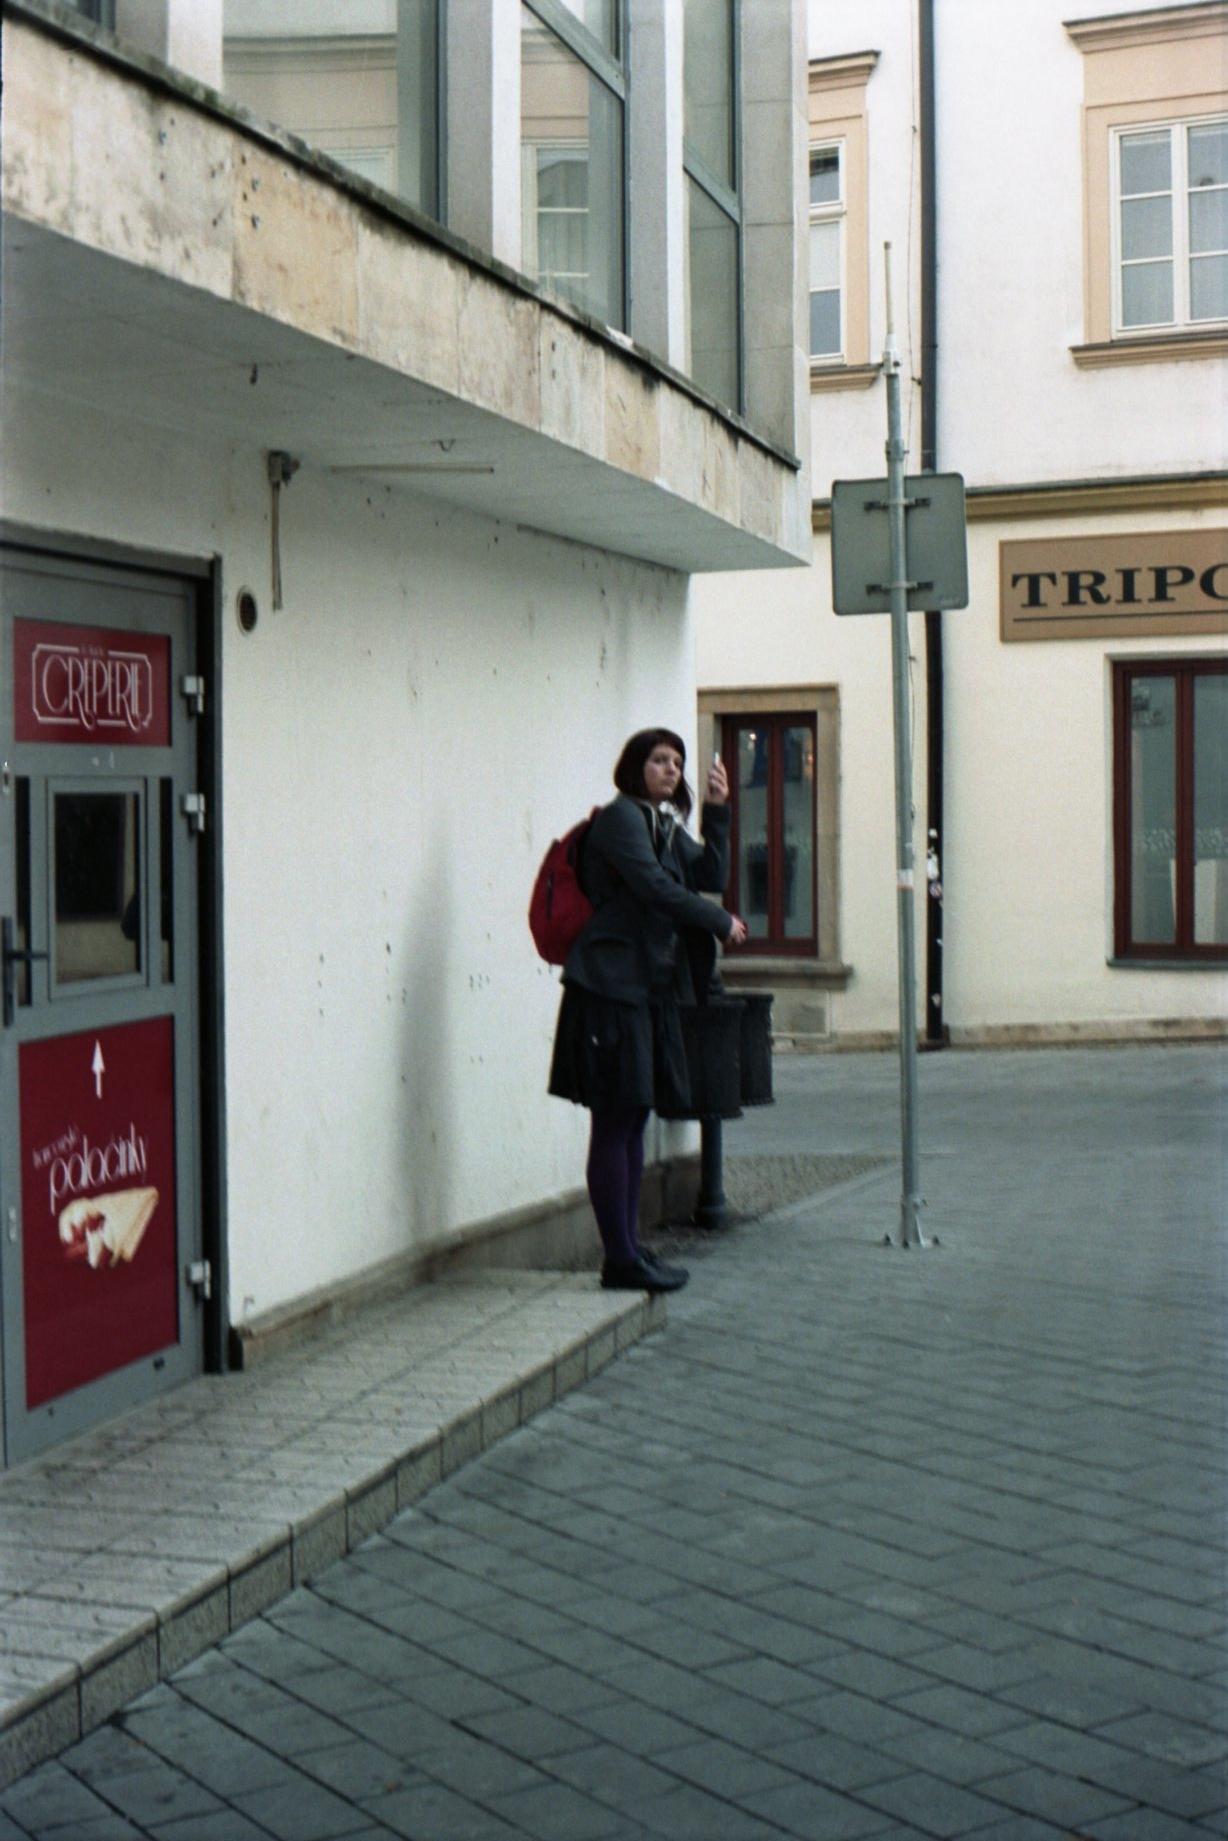 Zorki 4 + Industar-61 L/D - Woman with a Phone